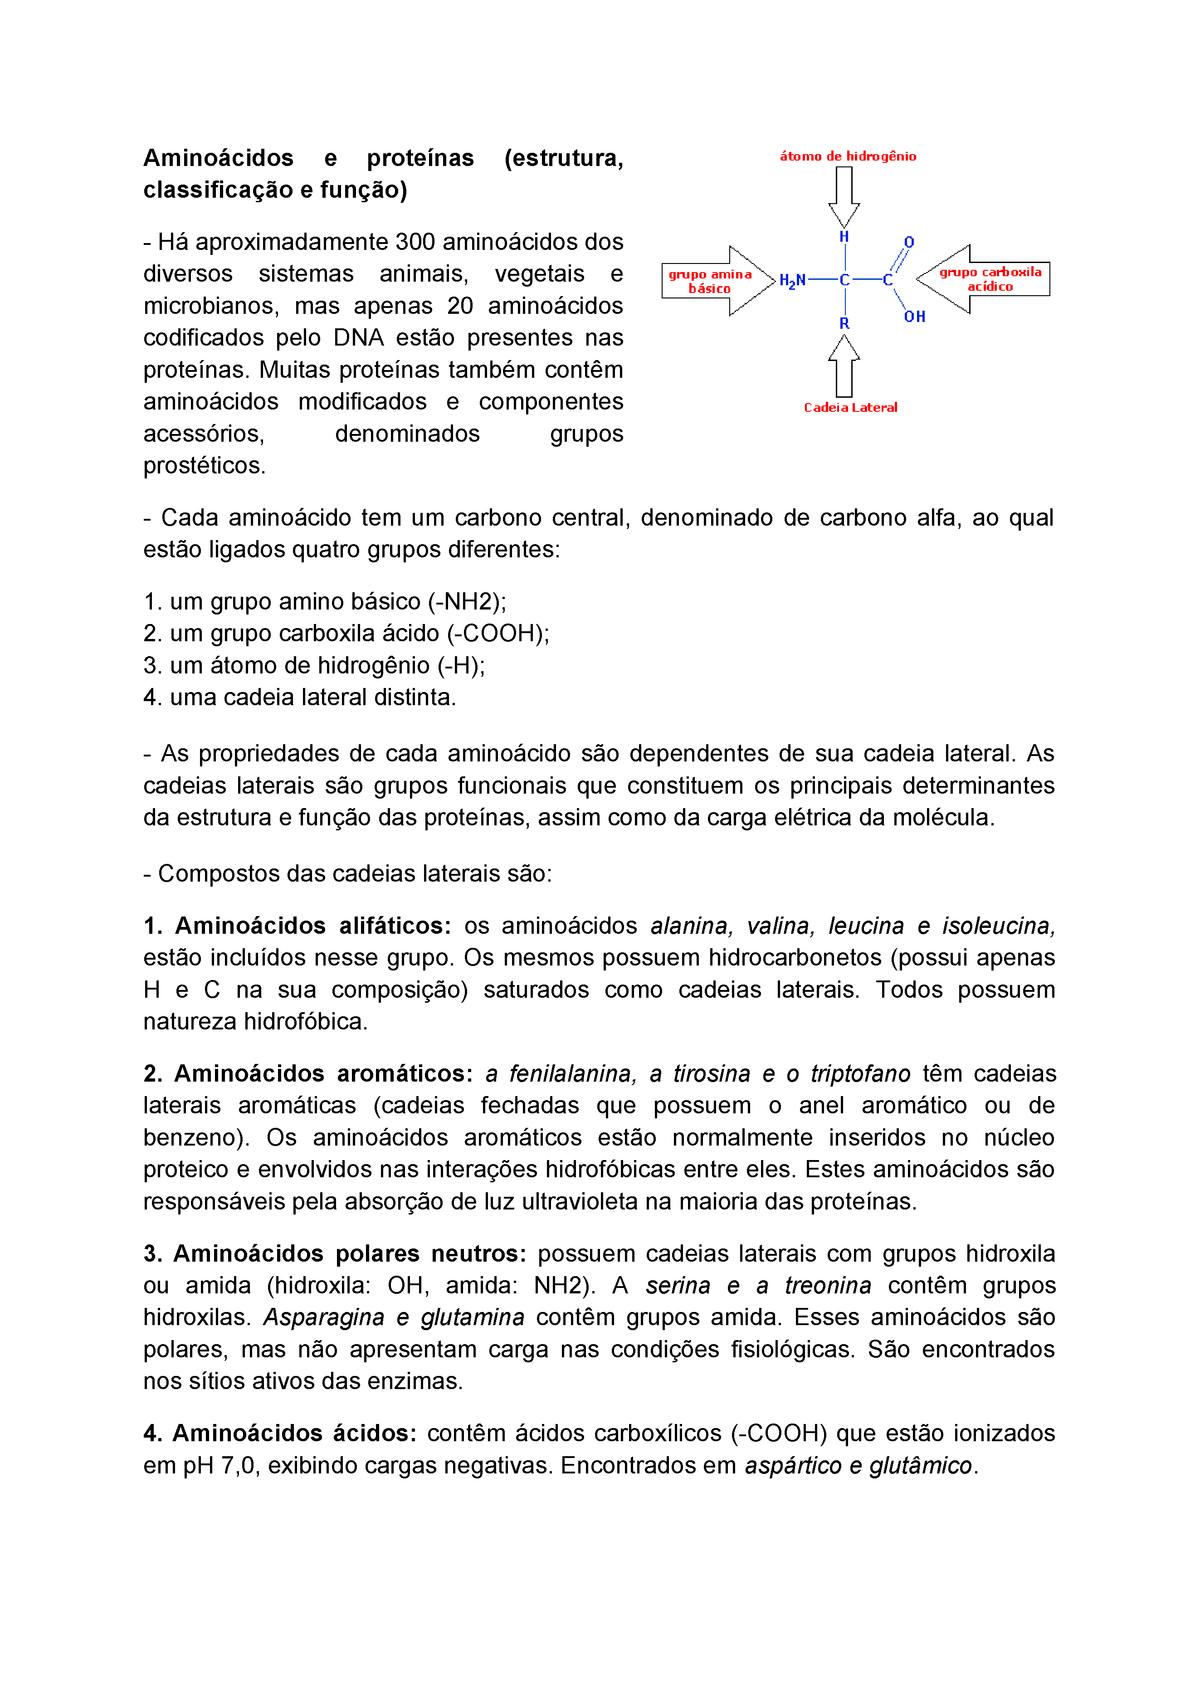 Nutrientes Aminoácidos E Proteínas Estrutura